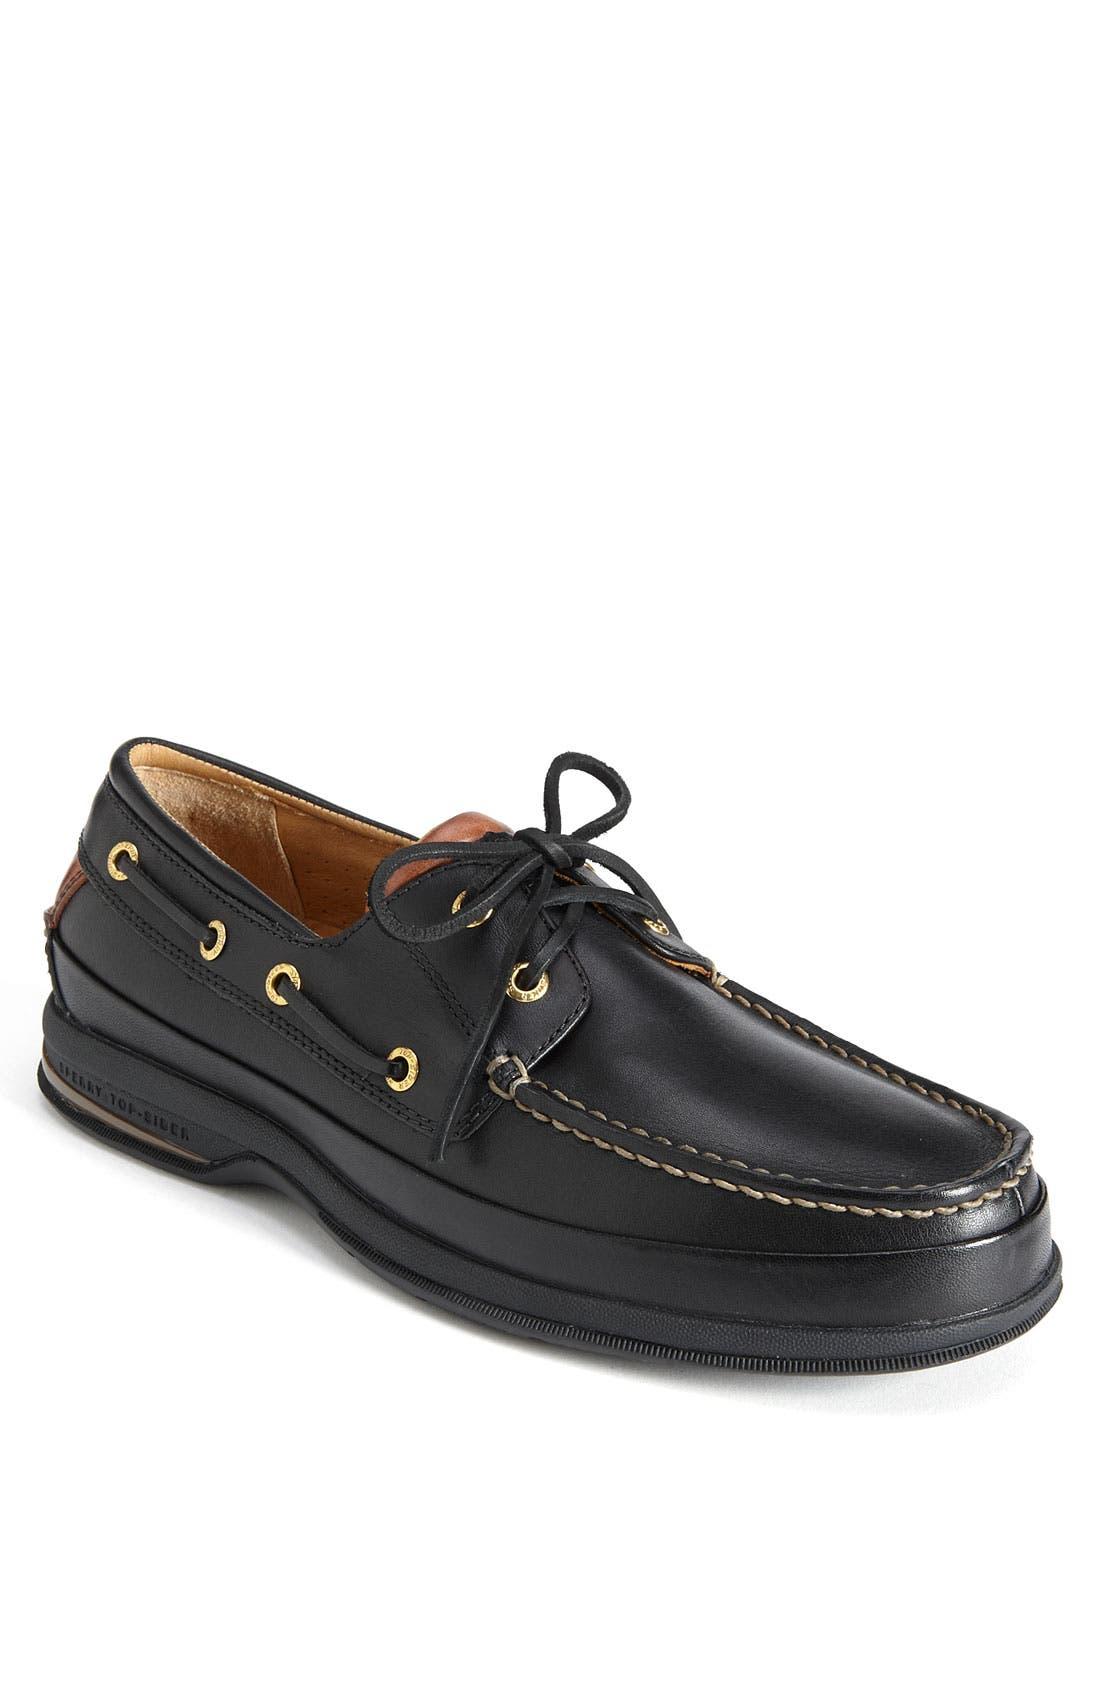 Main Image - Sperry 'Gold Cup 2-Eye ASV' Boat Shoe (Men)